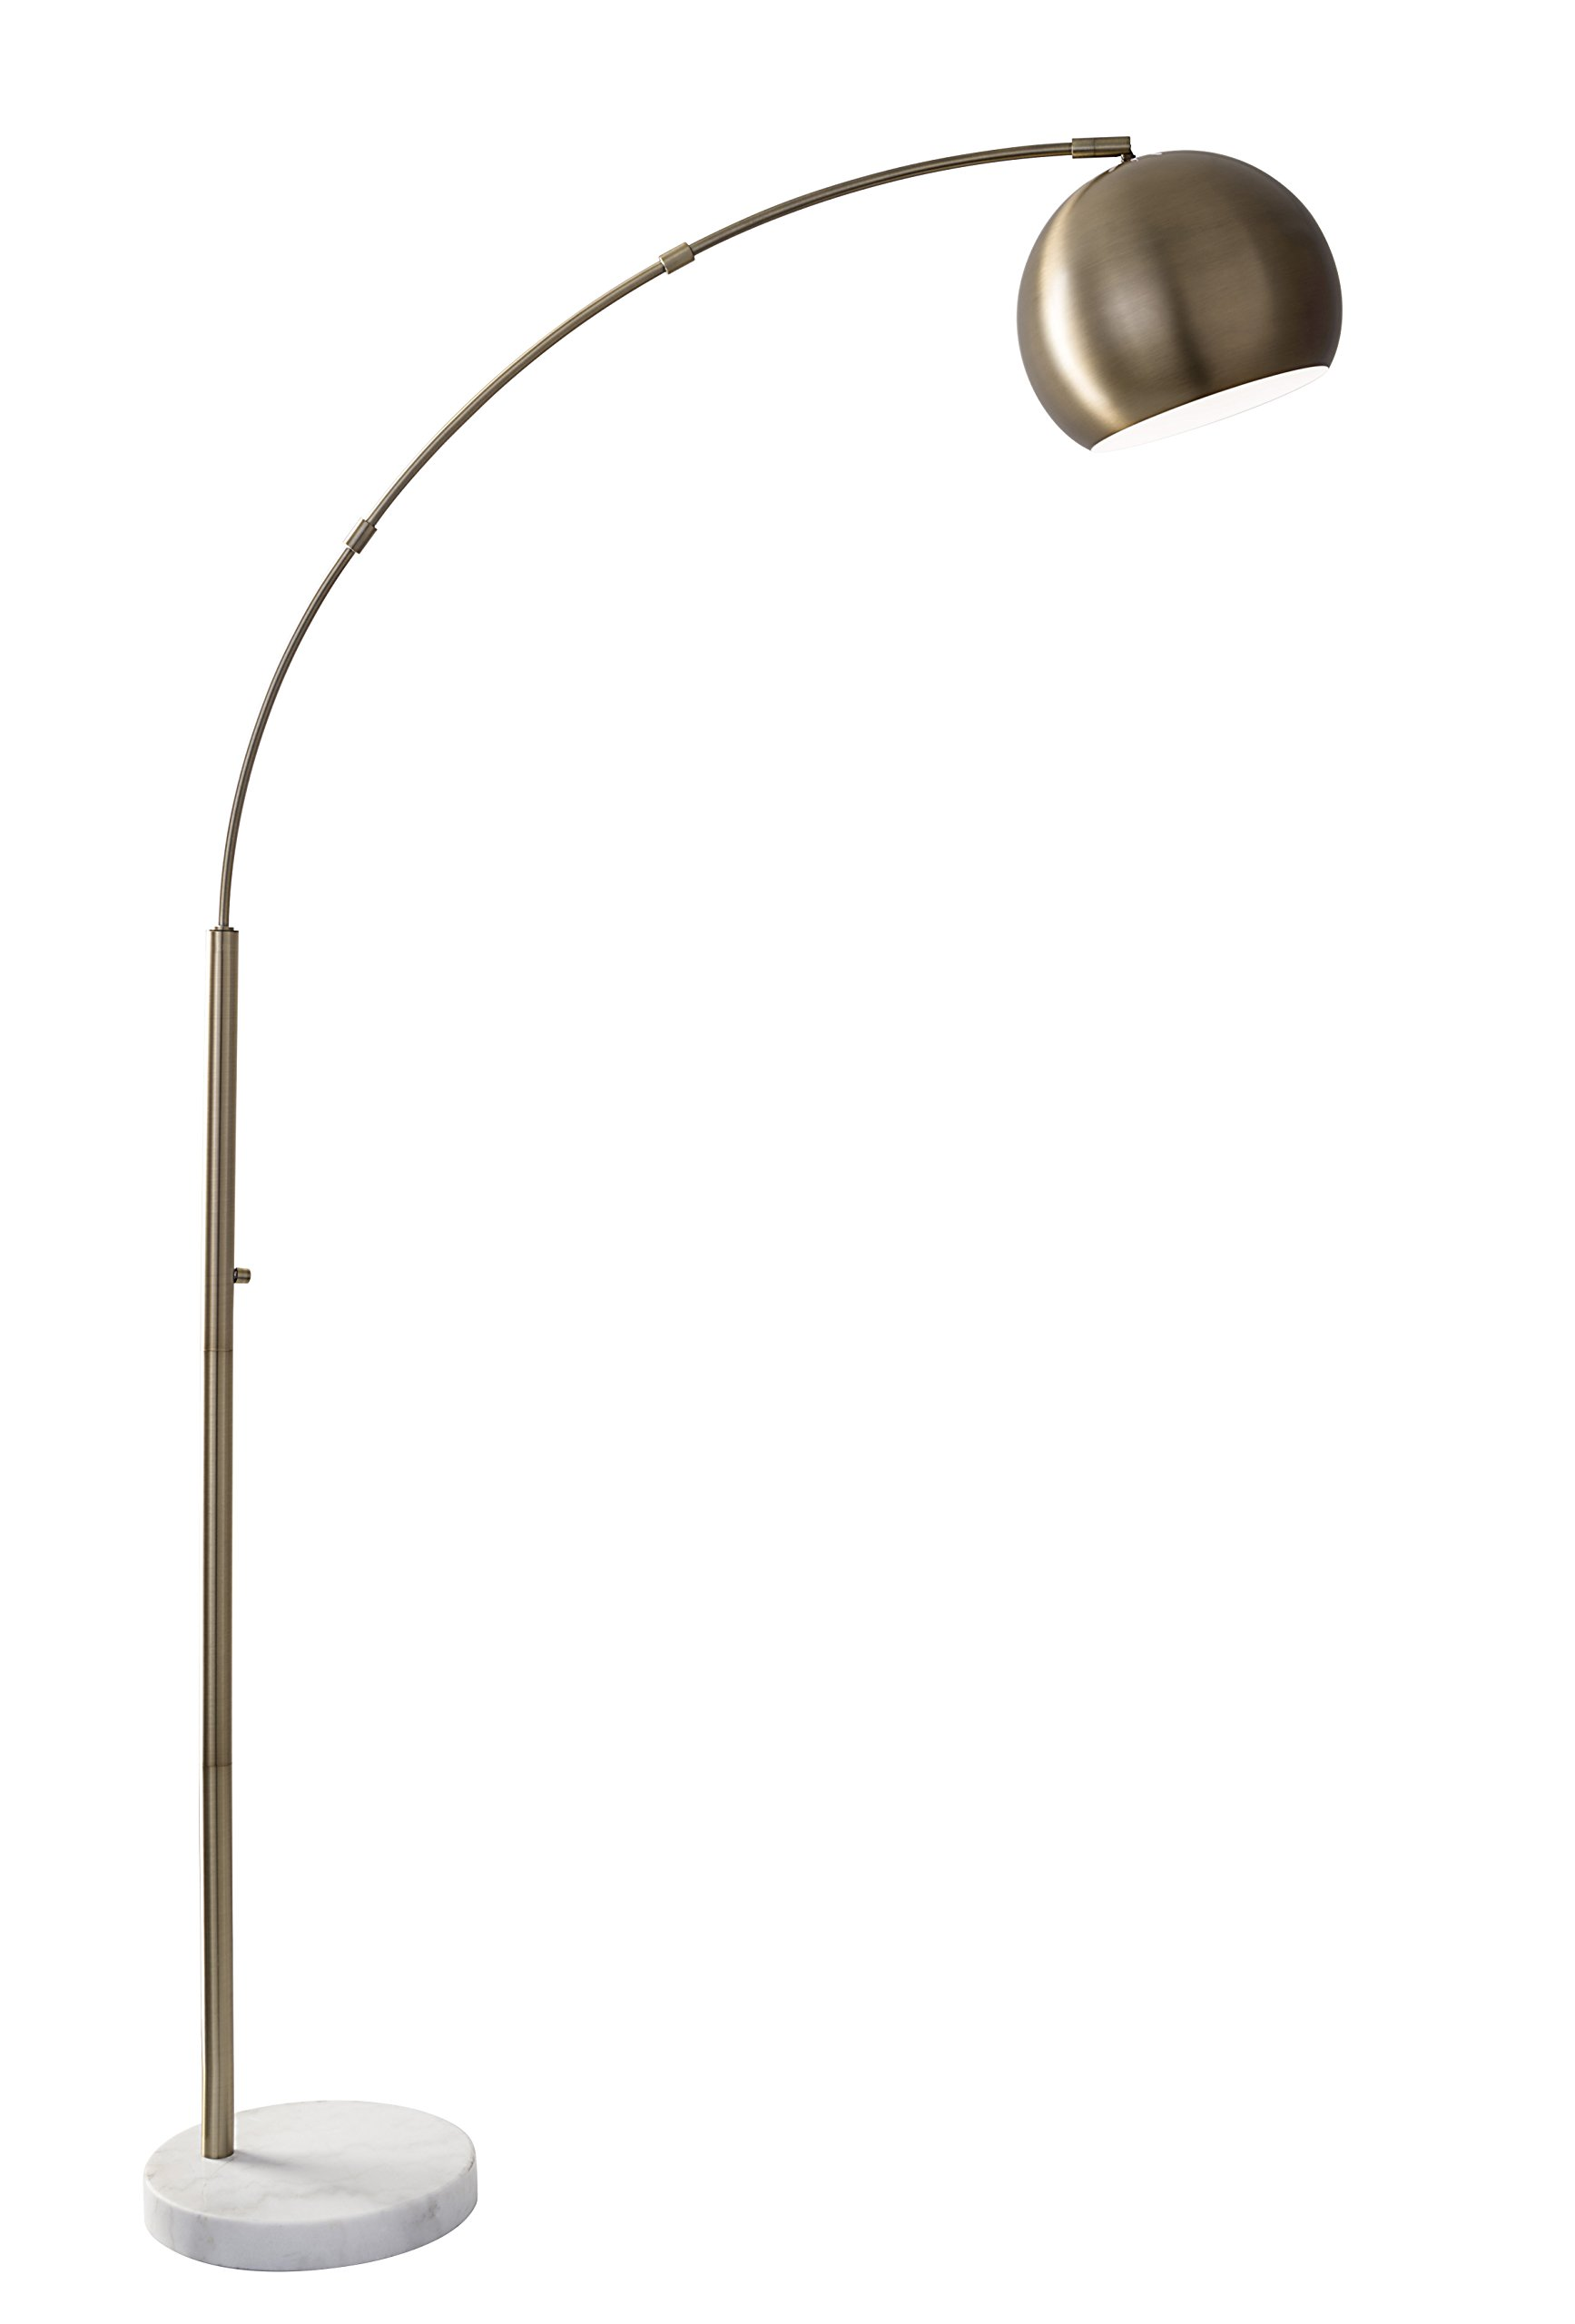 Adesso 5170-21 Astoria 78'' Modern Chic Astoria Arc Lamp, Antique Brass, Smart Outlet Compatible